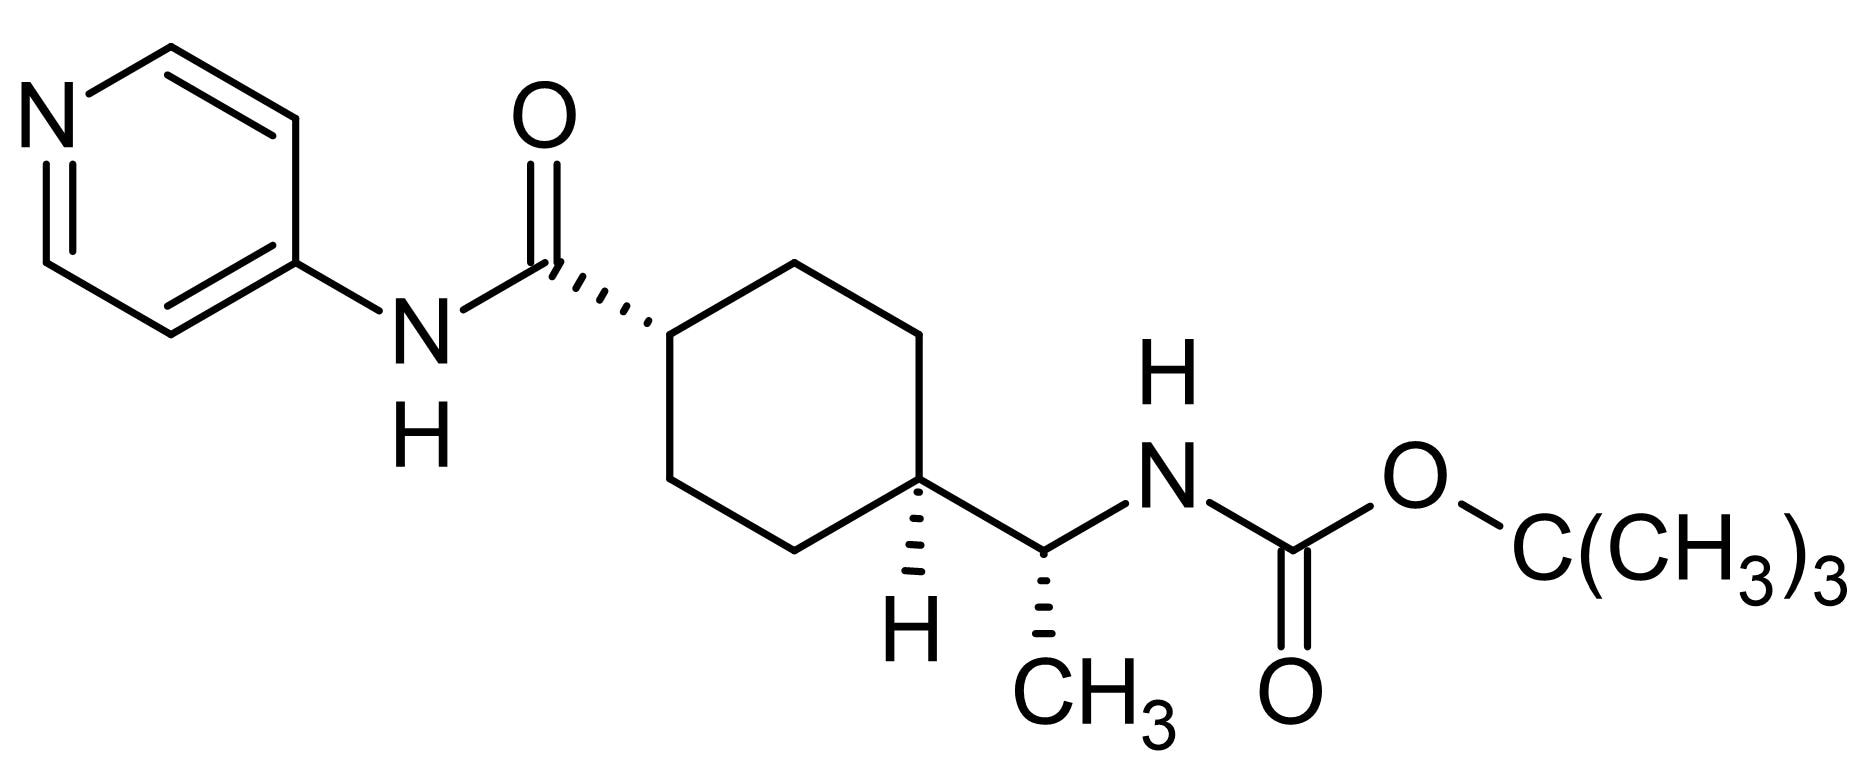 Chemical Structure - N-Boc-Y-27632, Rho kinase (ROCK) inhibitor (ab143784)